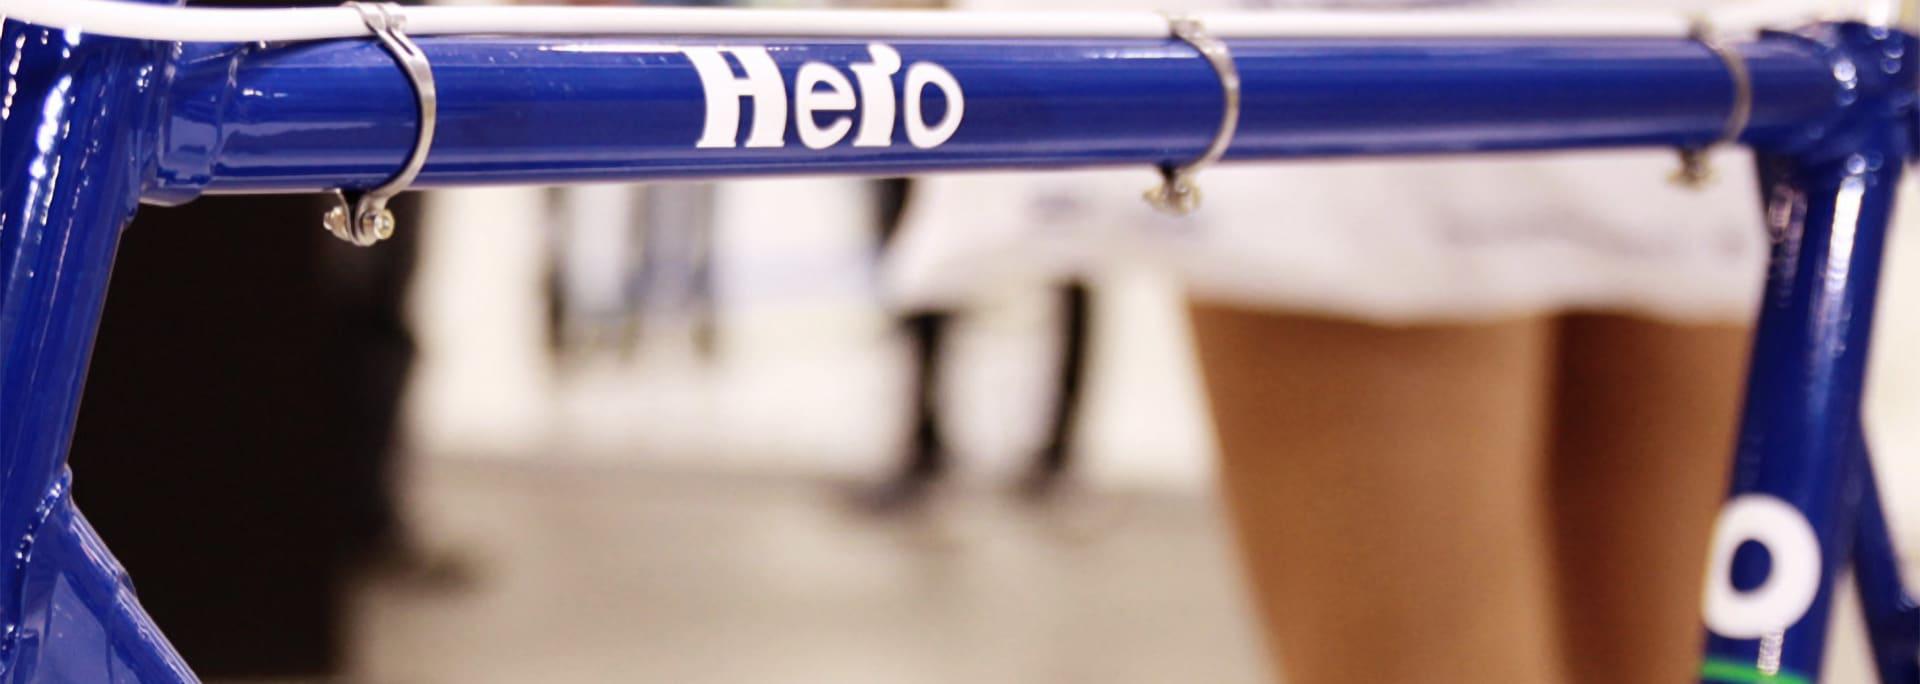 hero-a-cosmo-bike